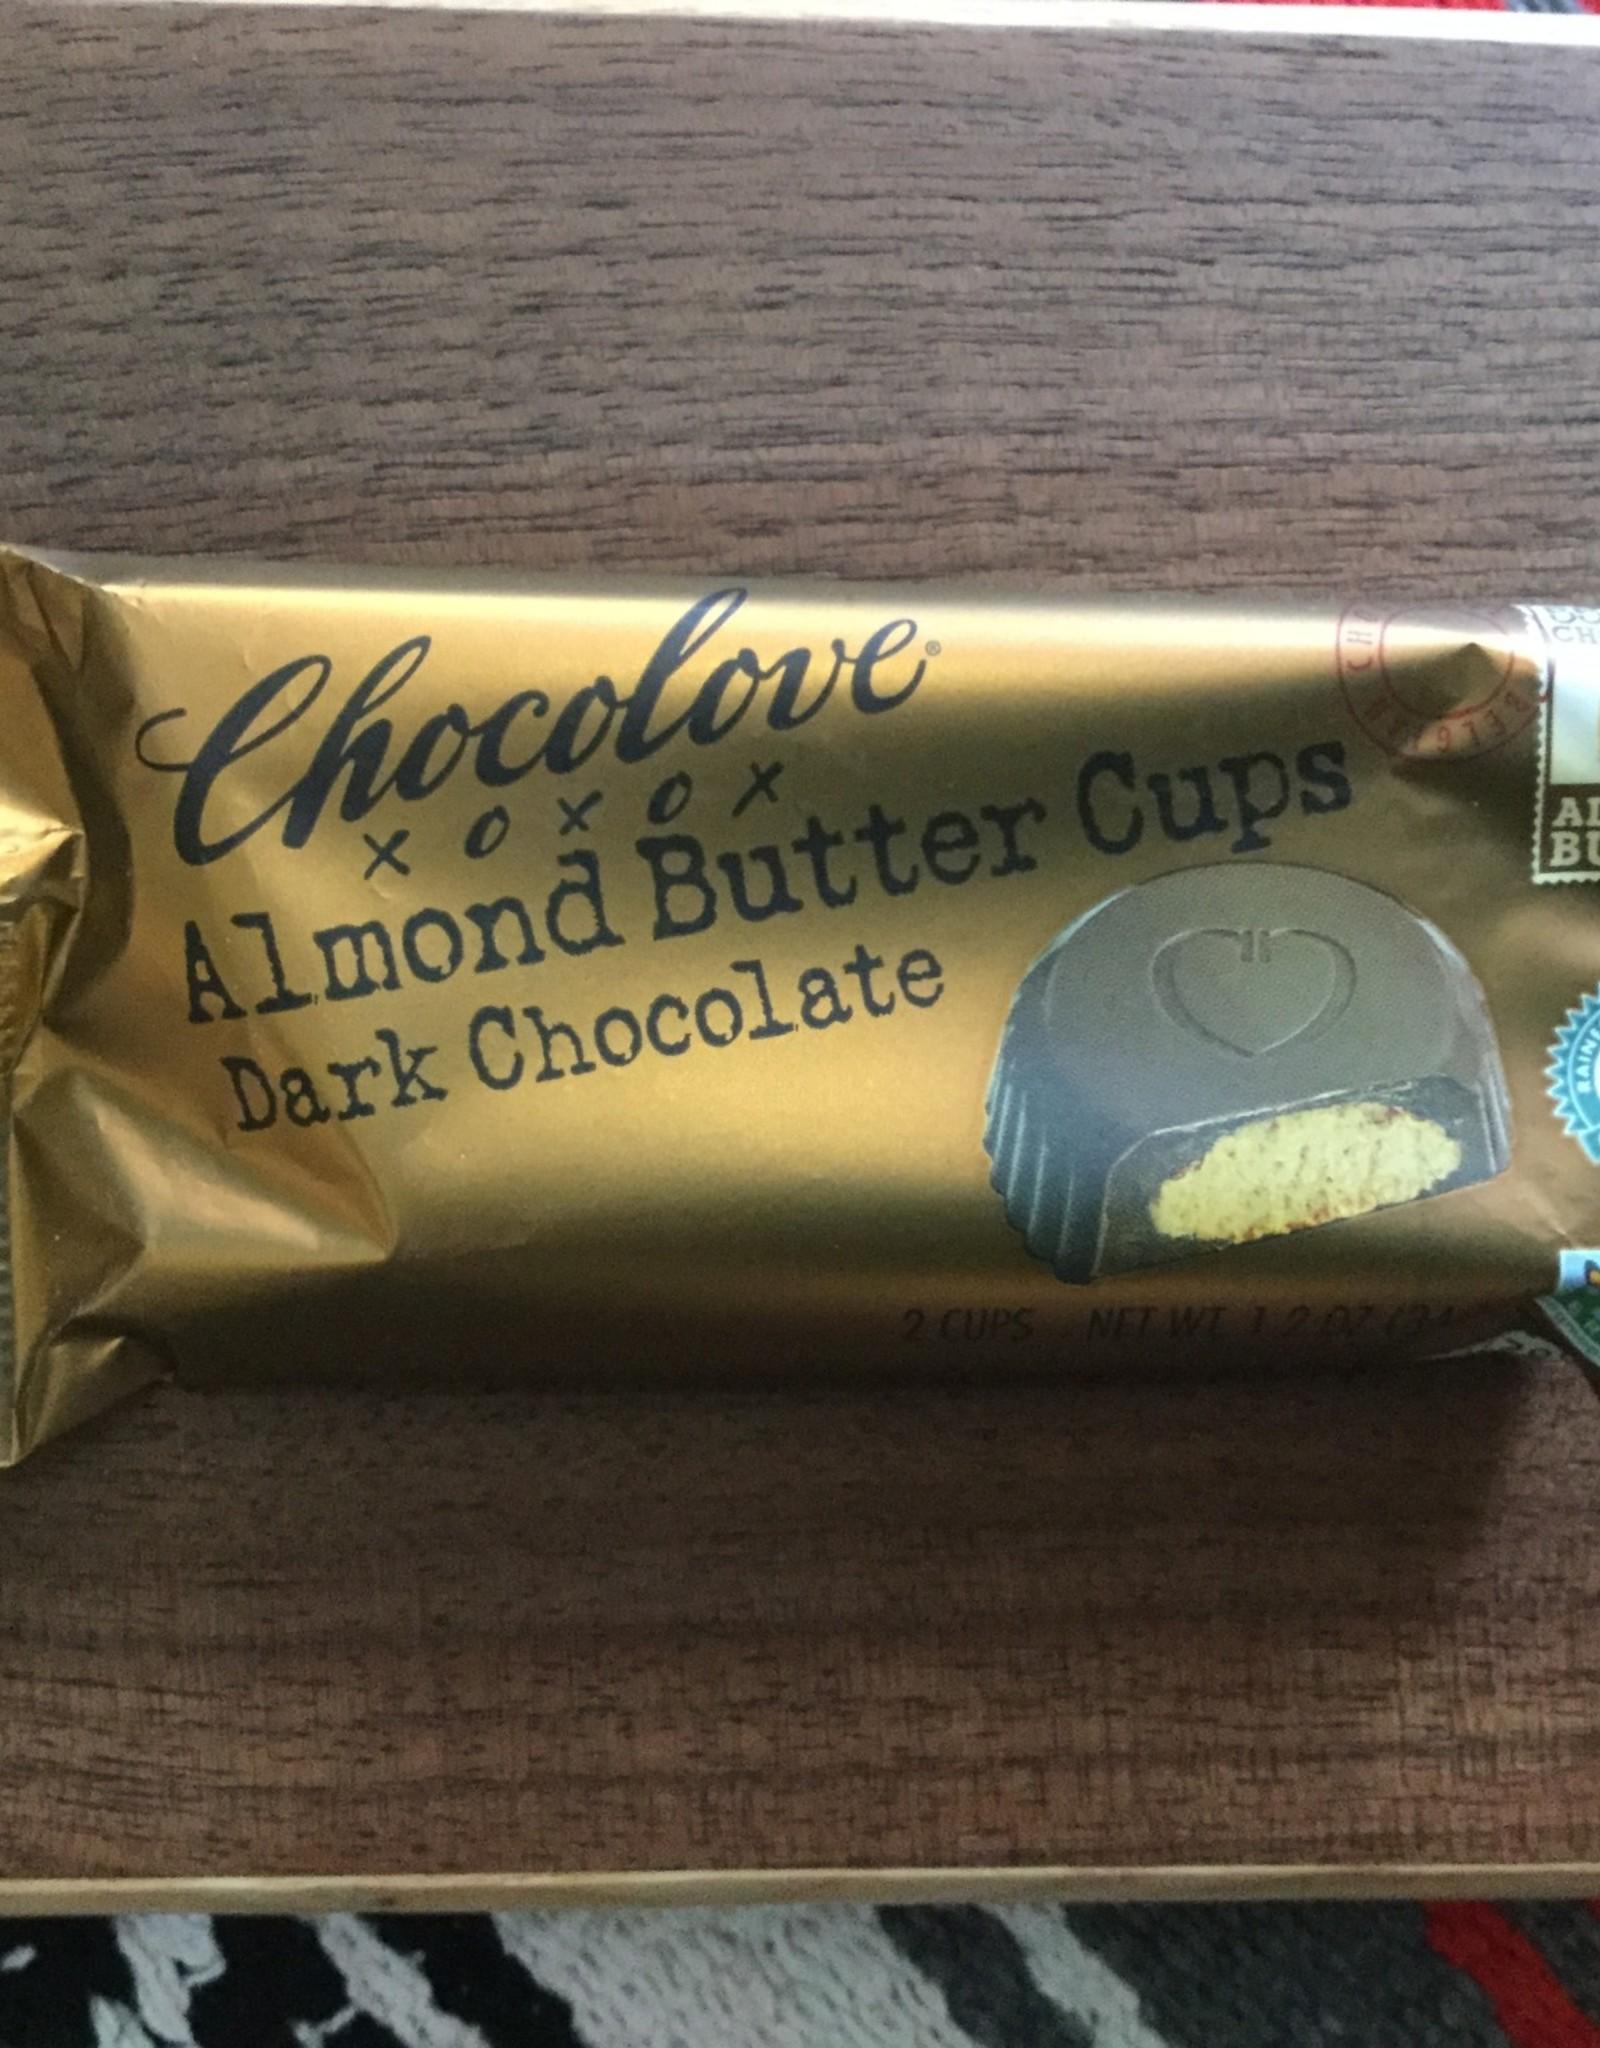 Chocolove Almond Butter Dark Chocolate Cups